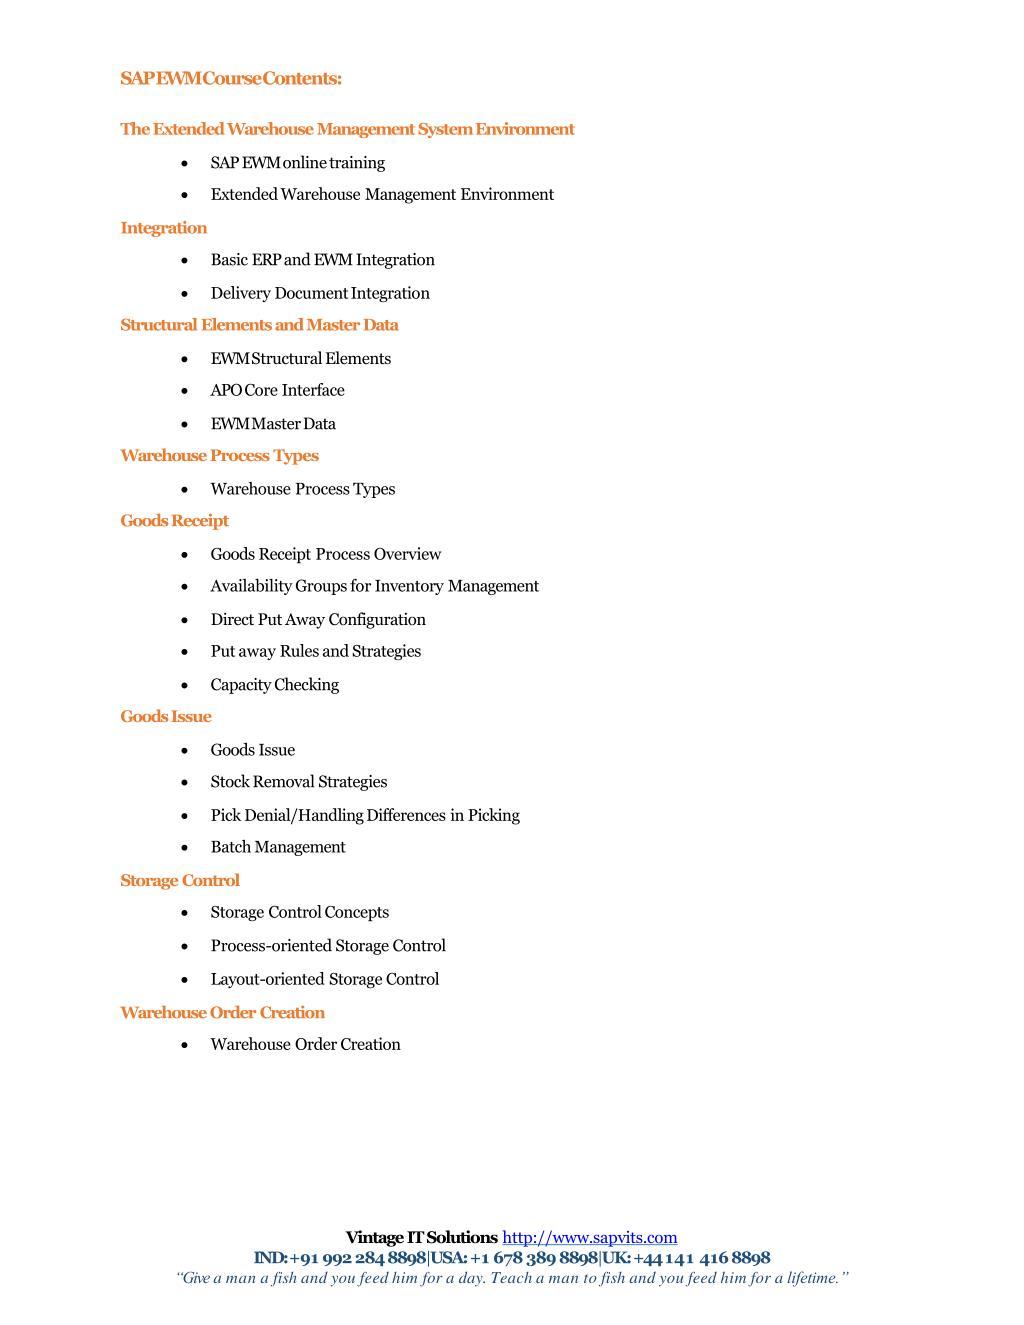 PPT - SAP EWMS PPT PowerPoint Presentation - ID:7924655